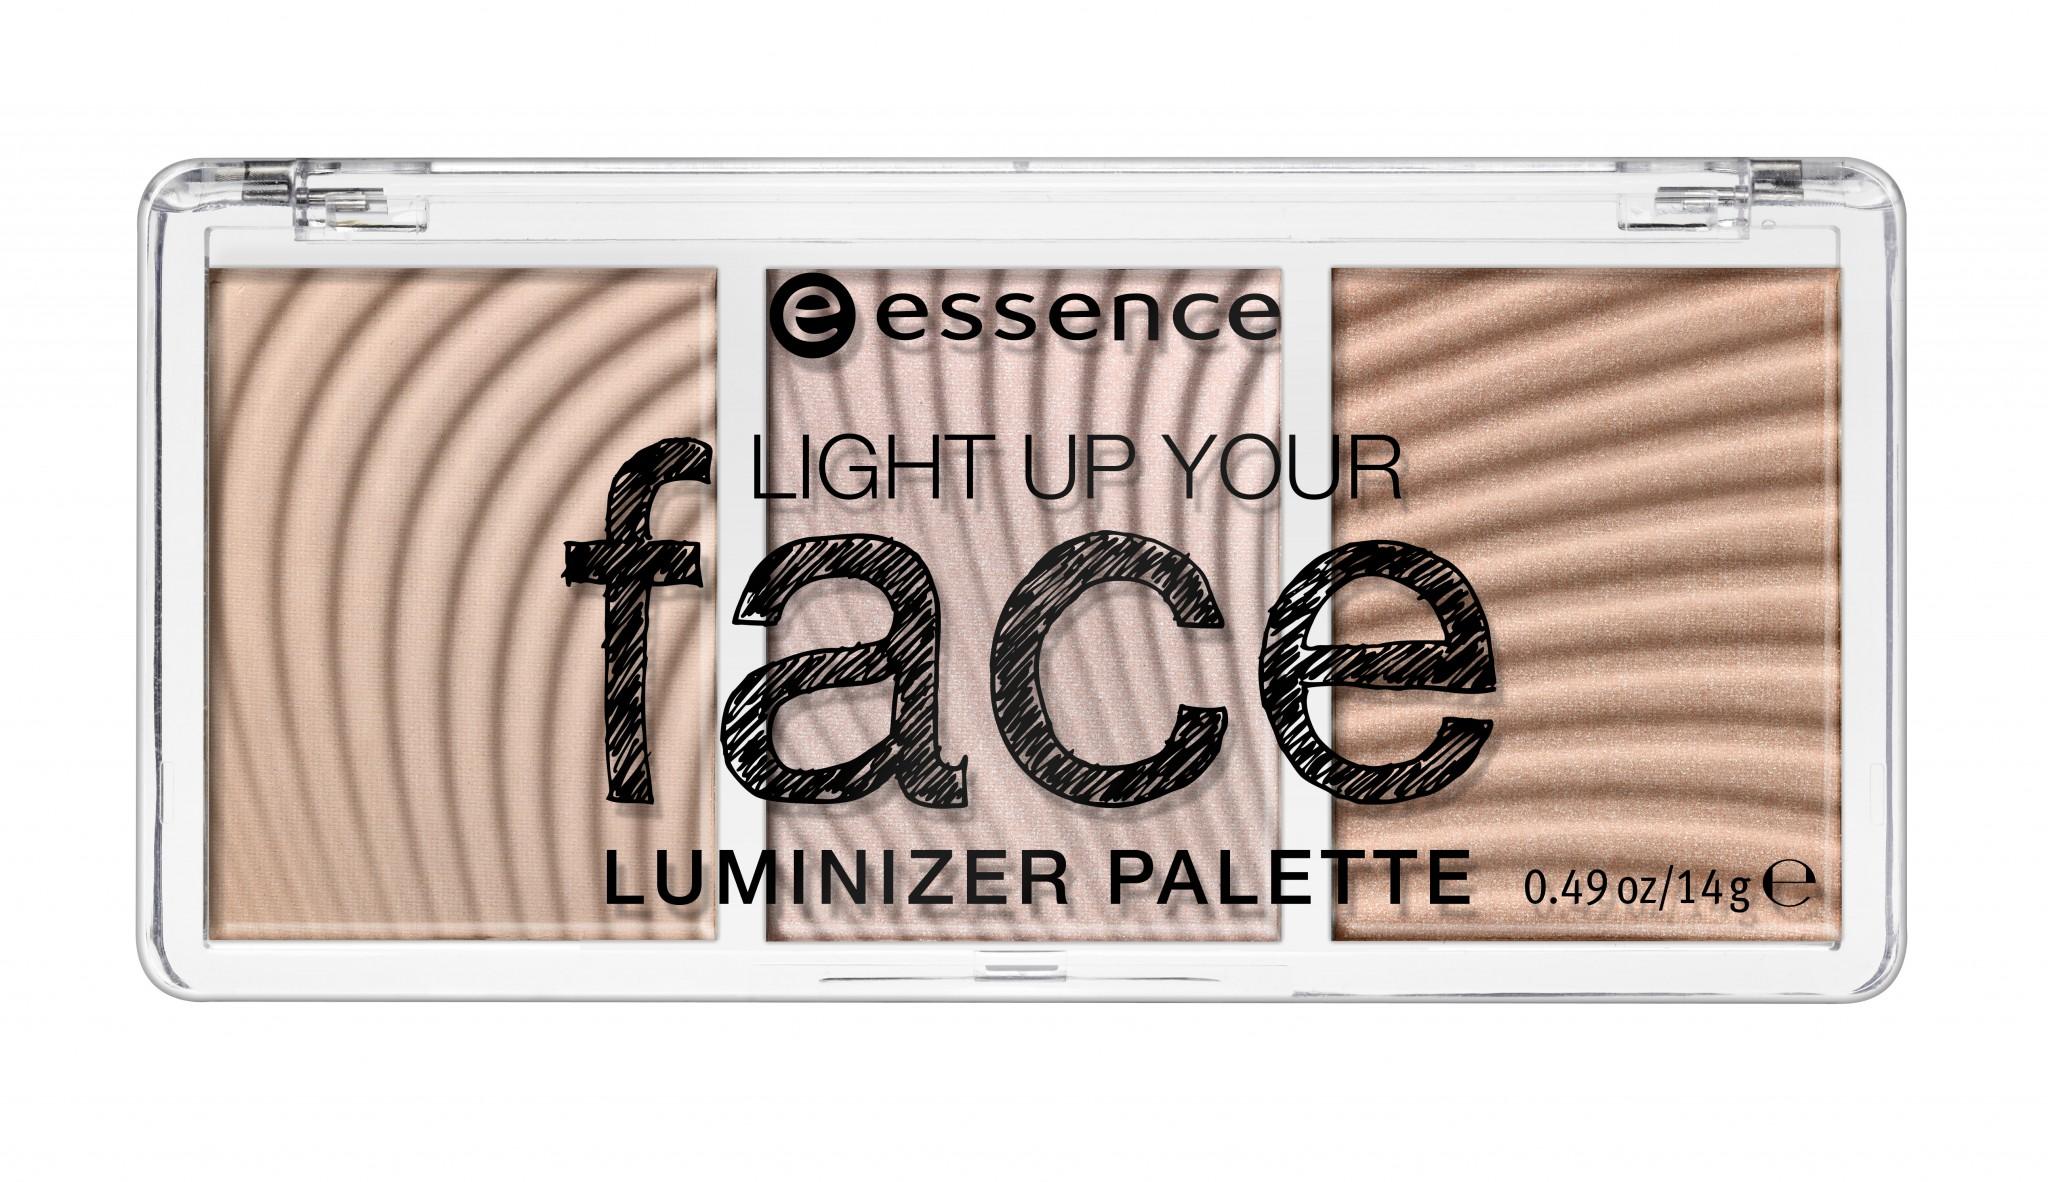 ess_Light_Up_your_face__Luminizer_Palette_10